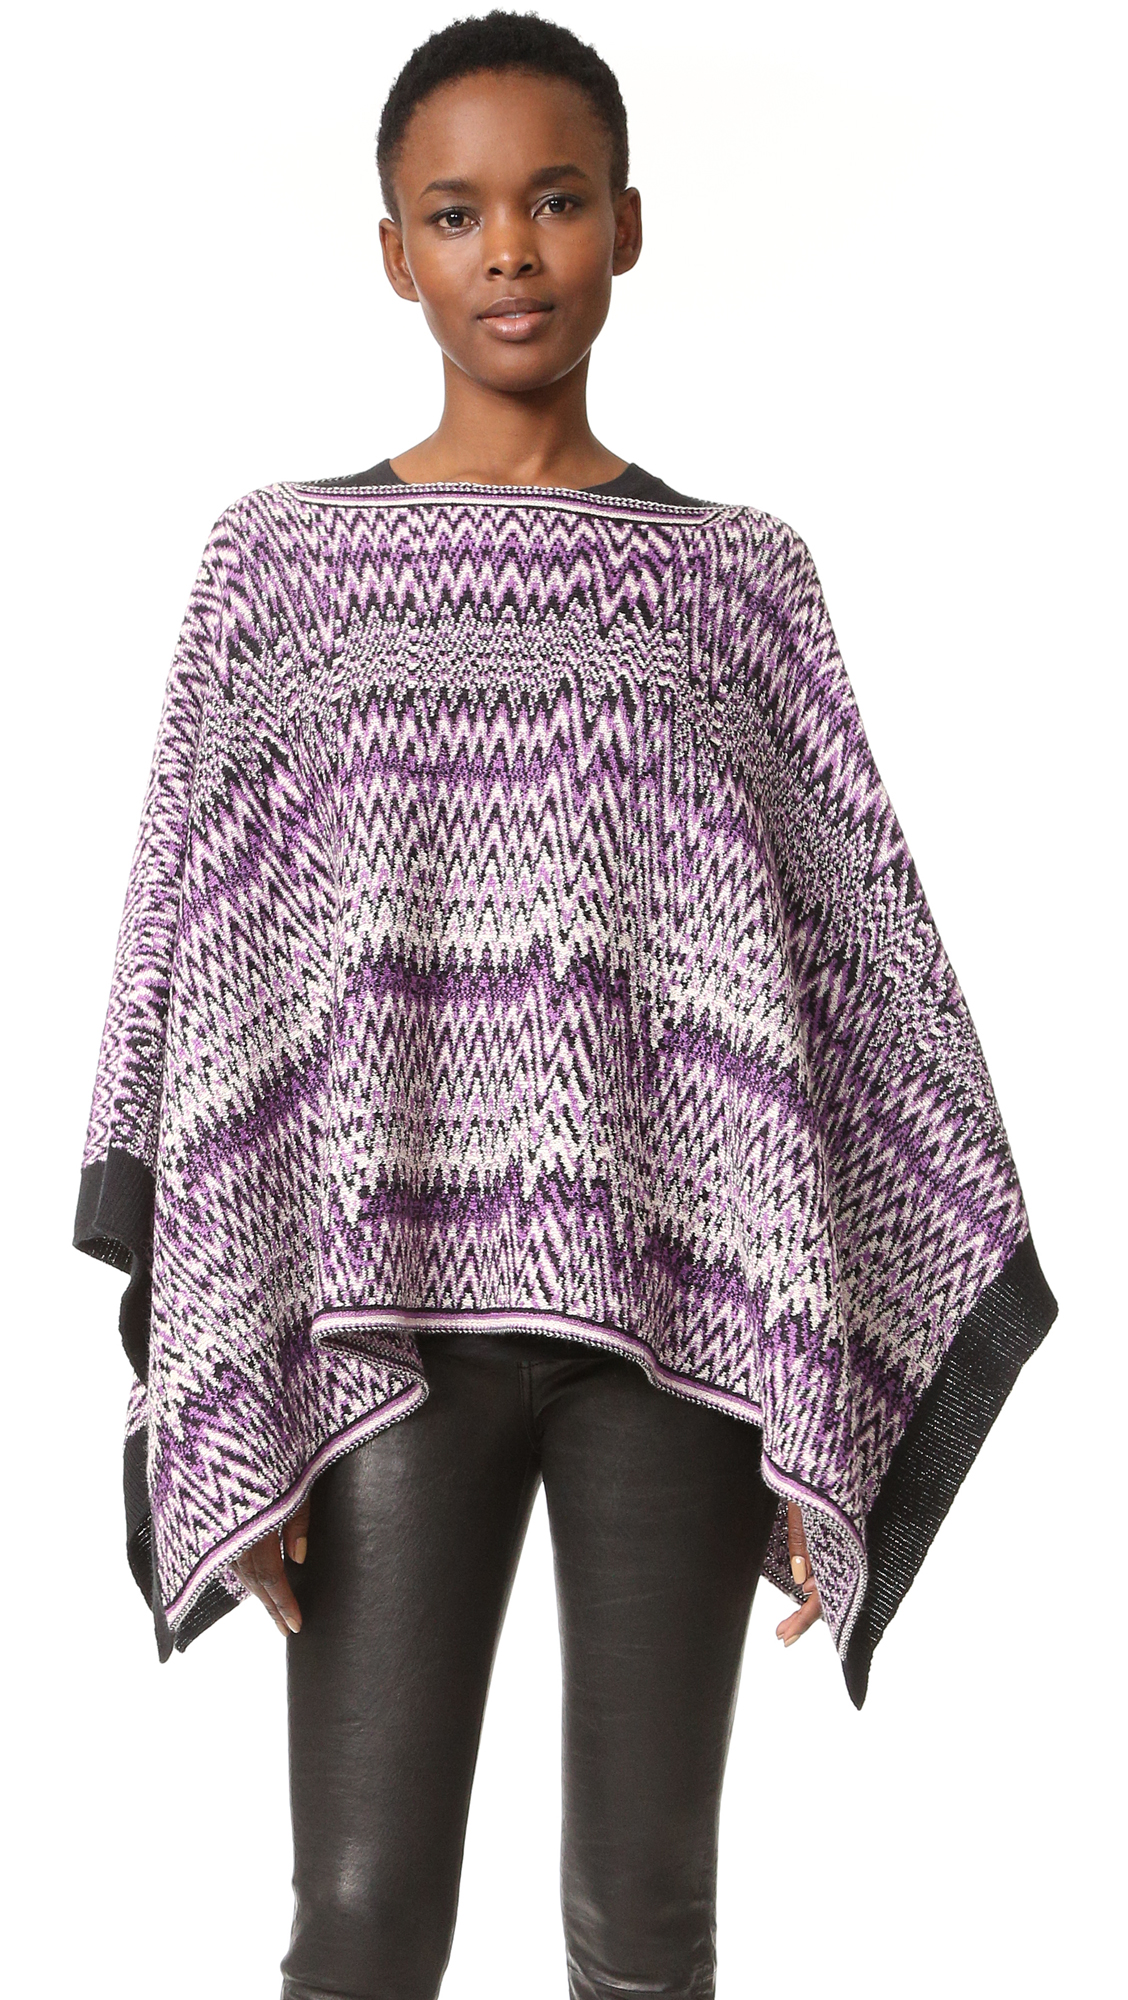 Missoni Zigzag Poncho - Purple Multi at Shopbop